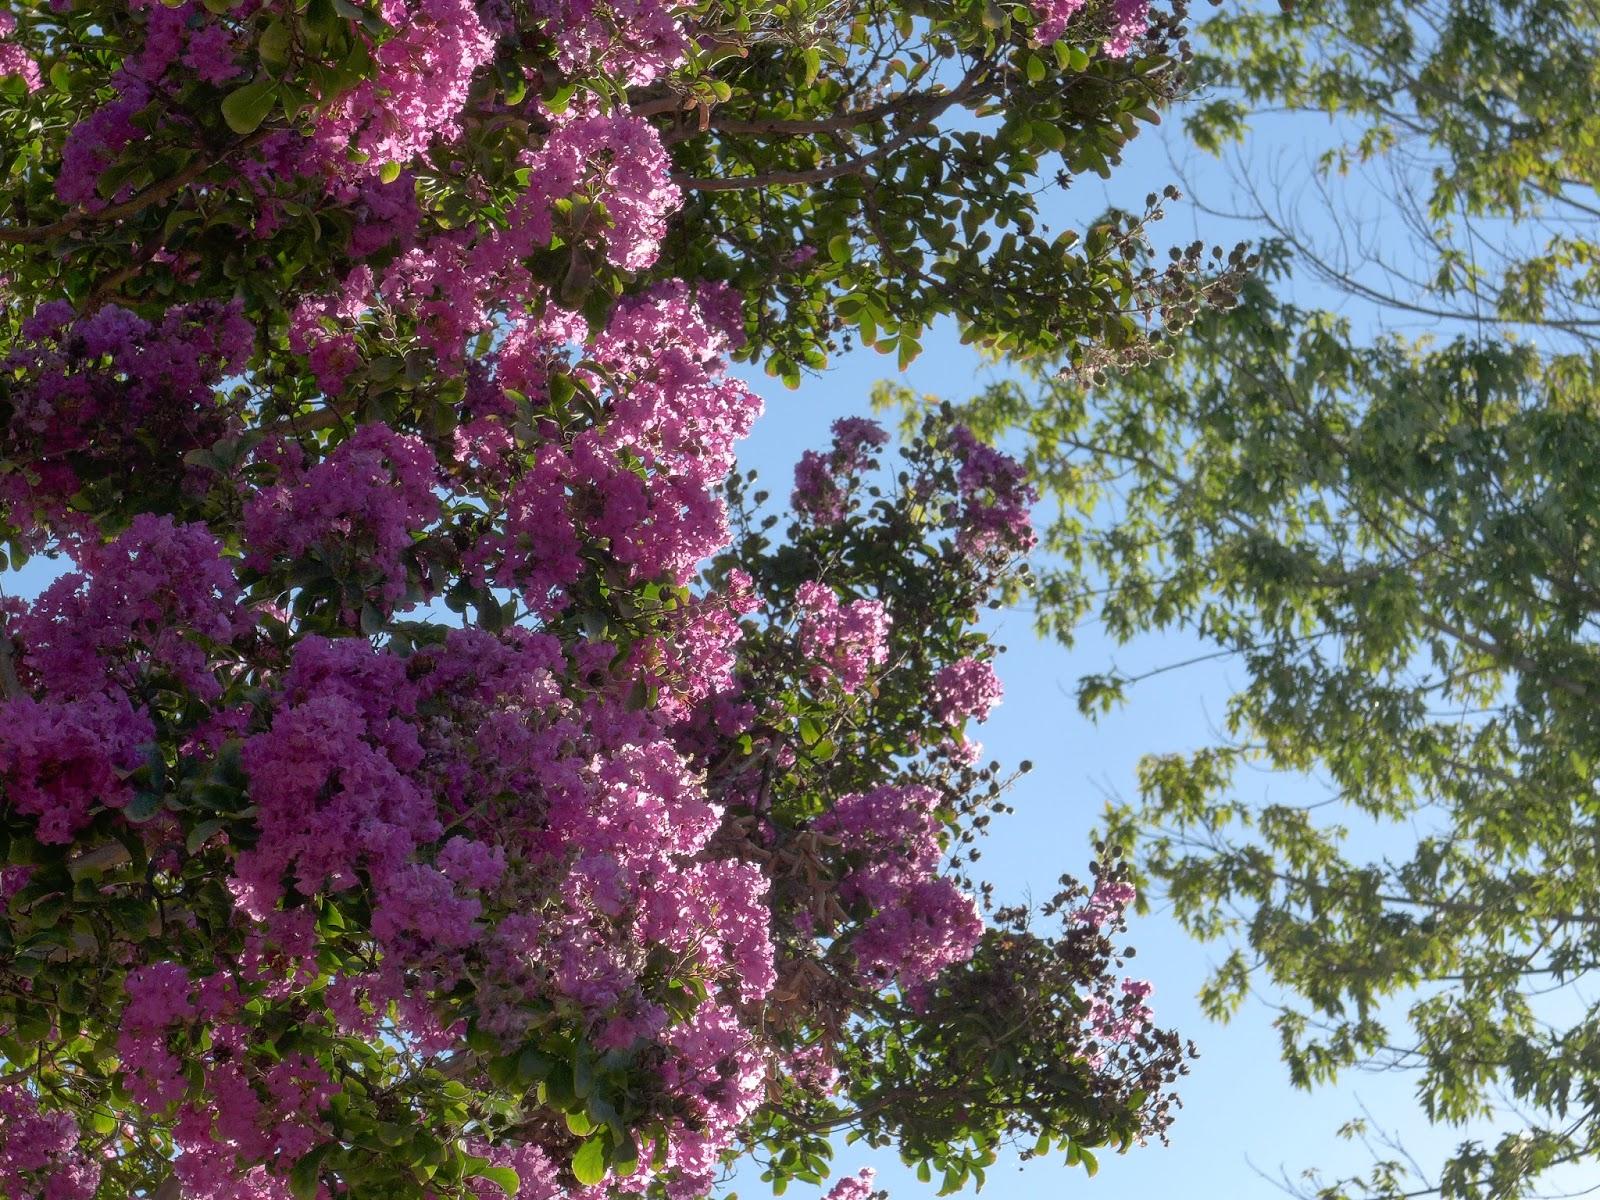 Crepe Myrtle 1 - West Hills, CA